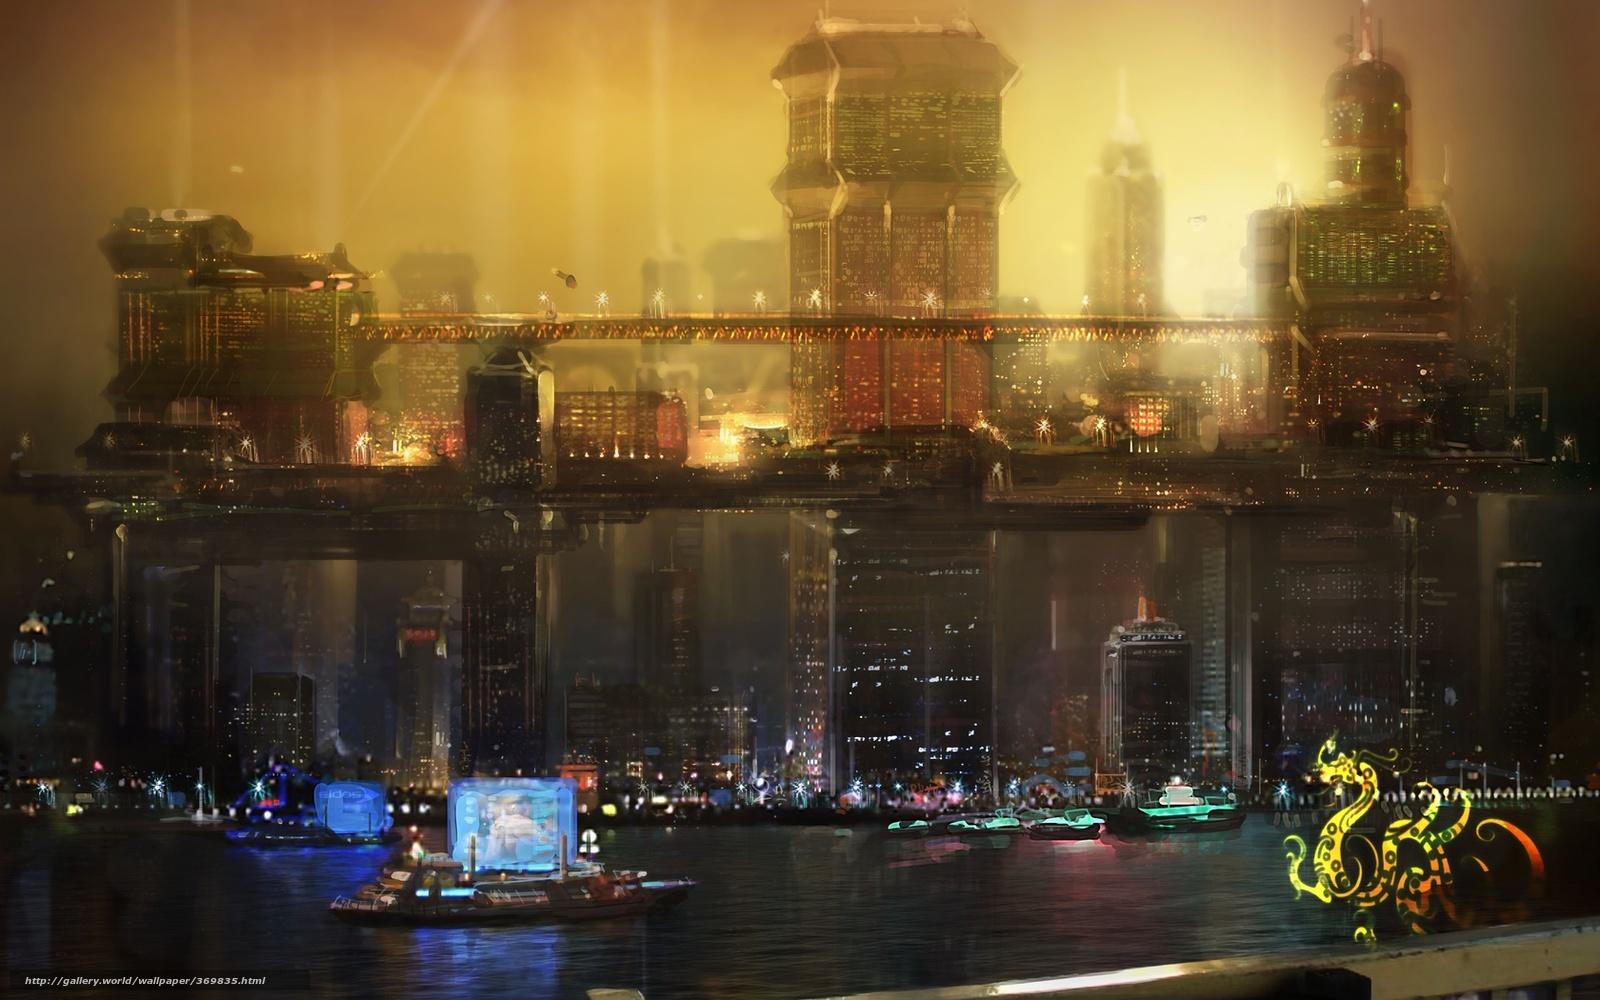 Future City Wallpaper Night | www.imgkid.com - The Image ...